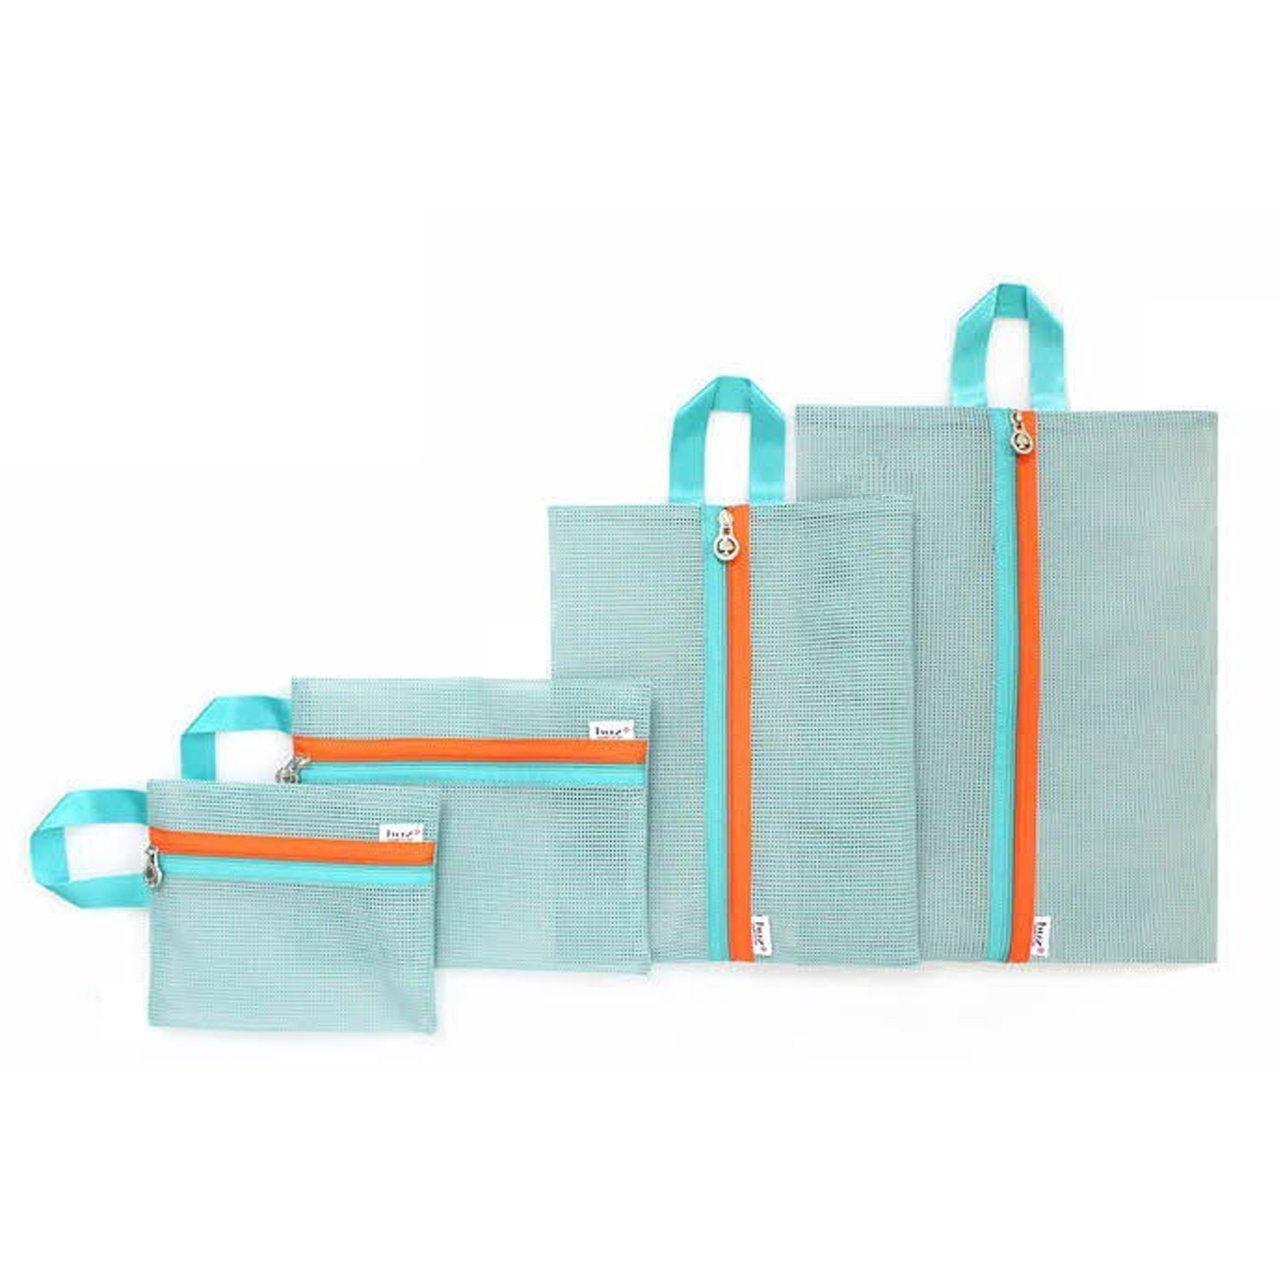 Sunreek 4 Pcs/set Portable Mesh Tote Bag Zipper Pouch Packable Toiletry Tote Underwear Organizer Storage Bag (Blue)